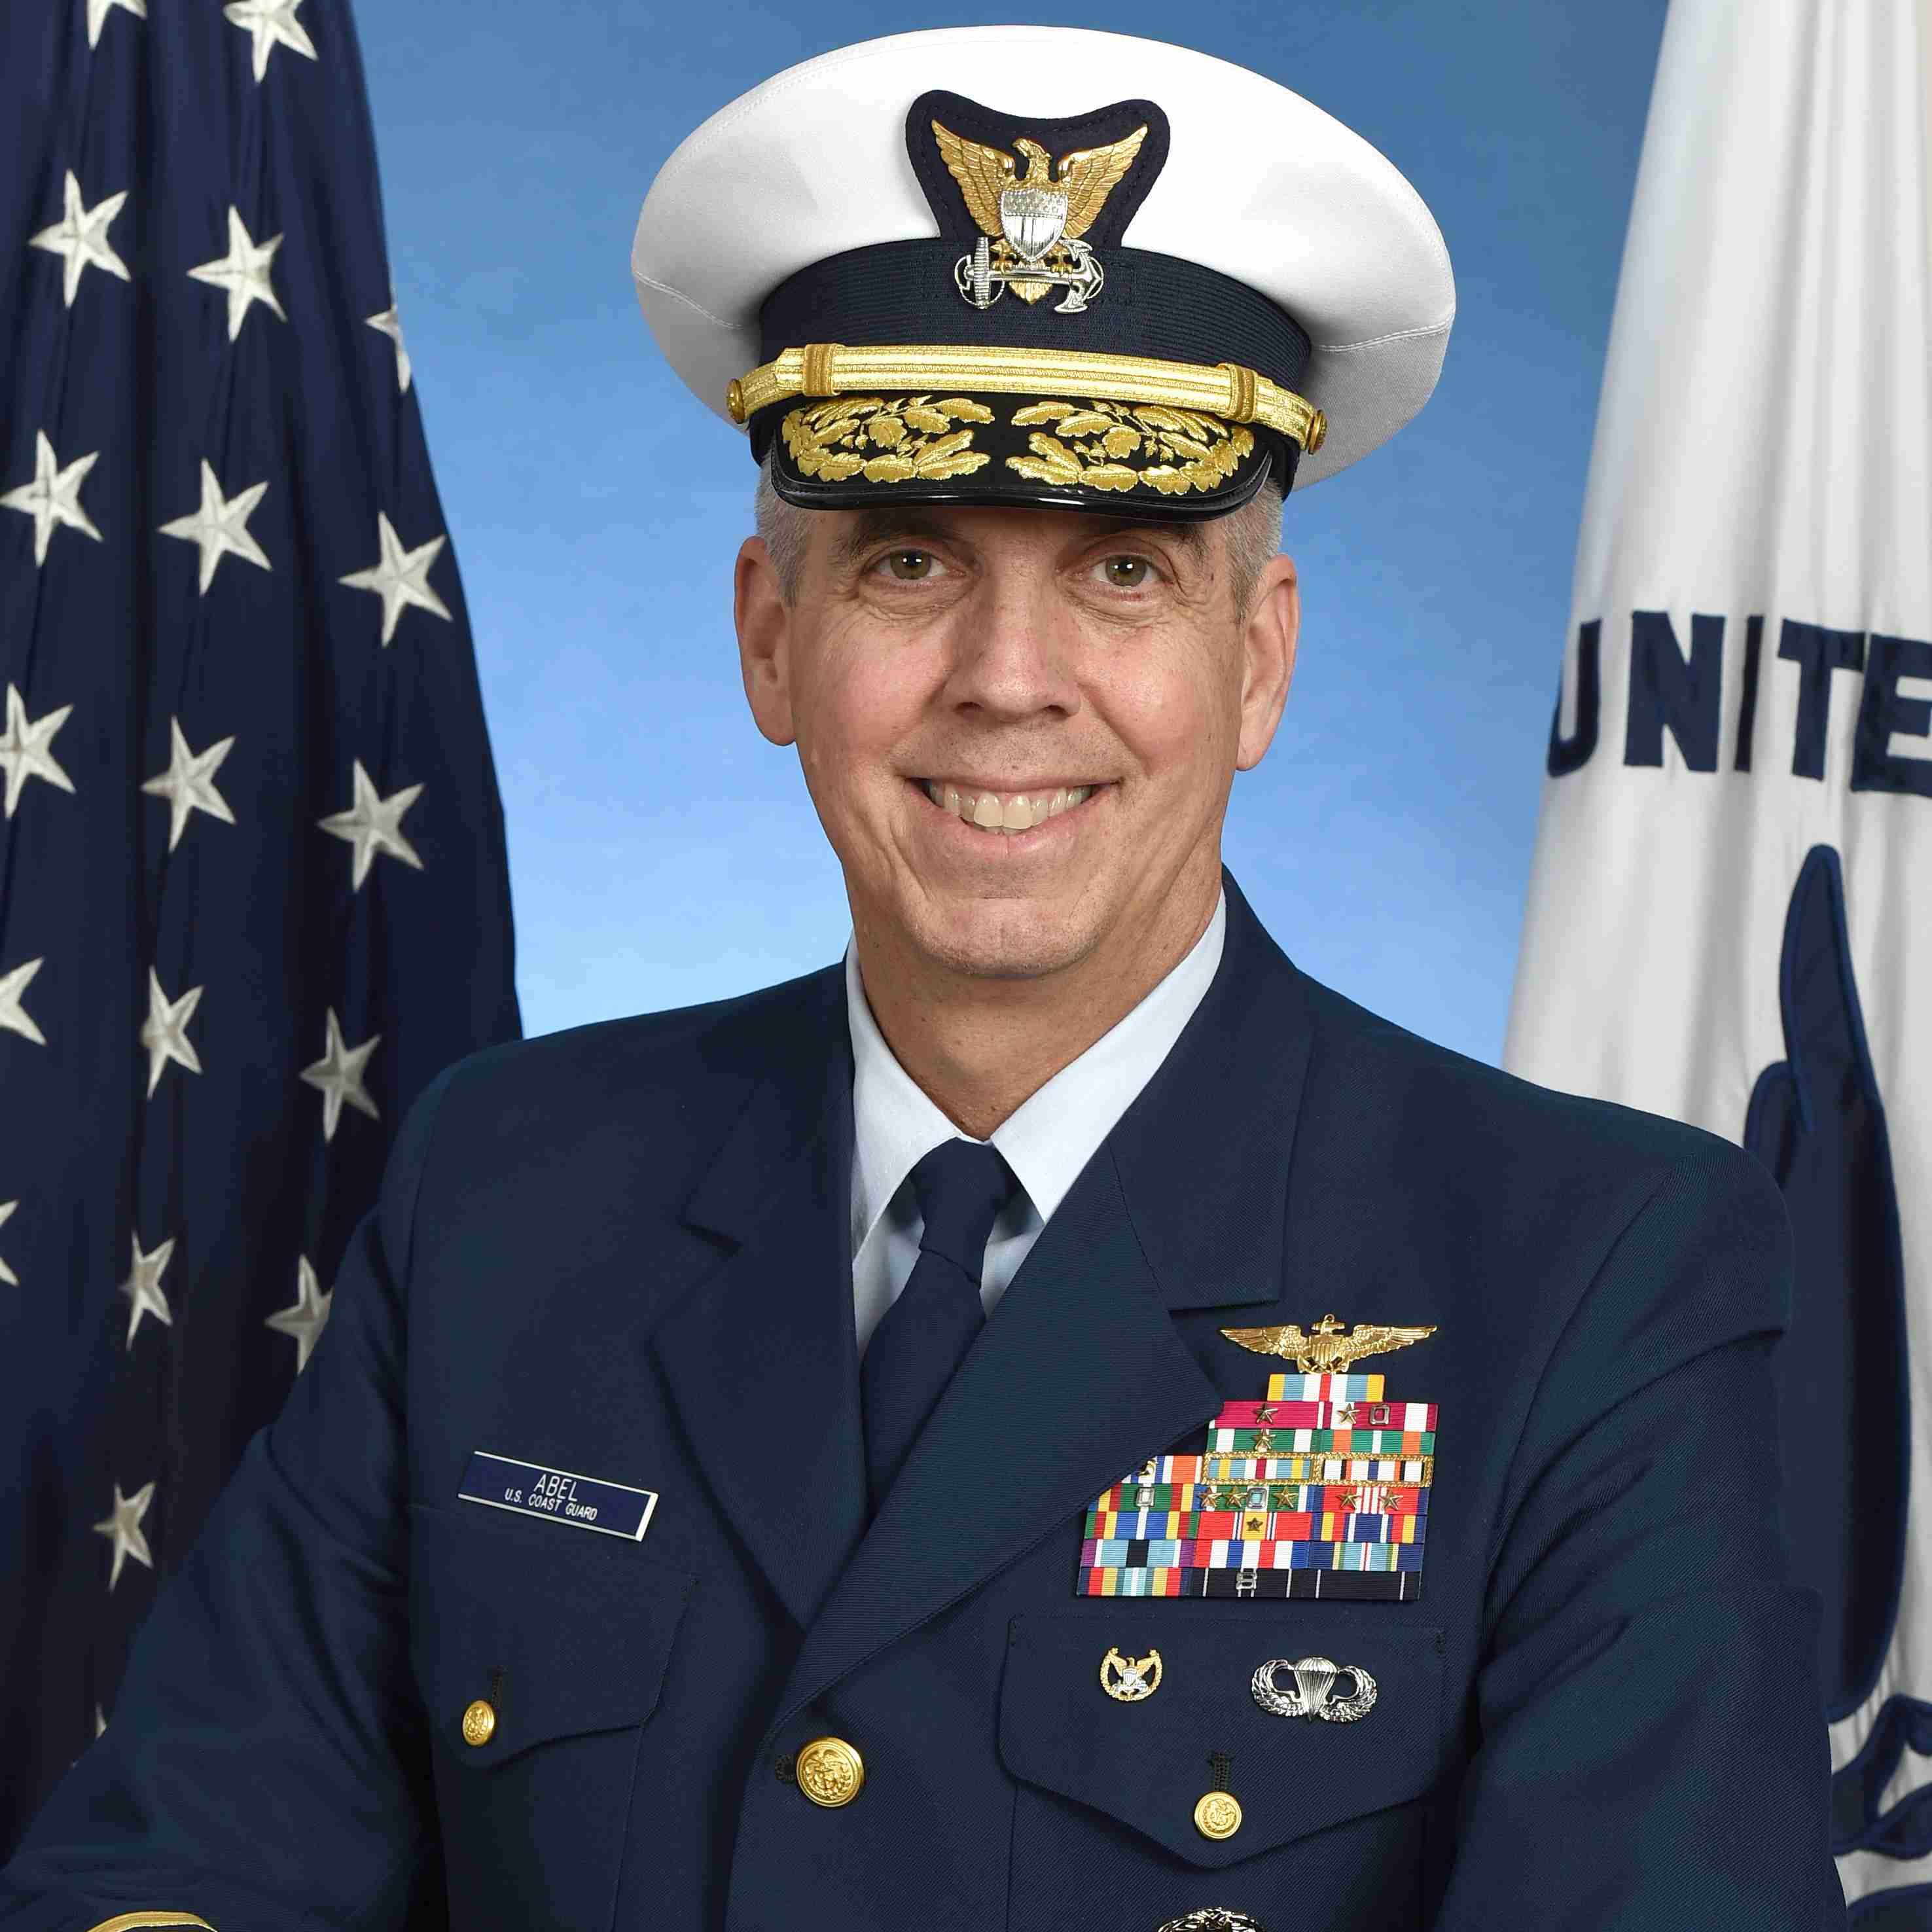 Vice Admiral Daniel B. Abel, Deputy Commandant for Operations, United States Coast Guard